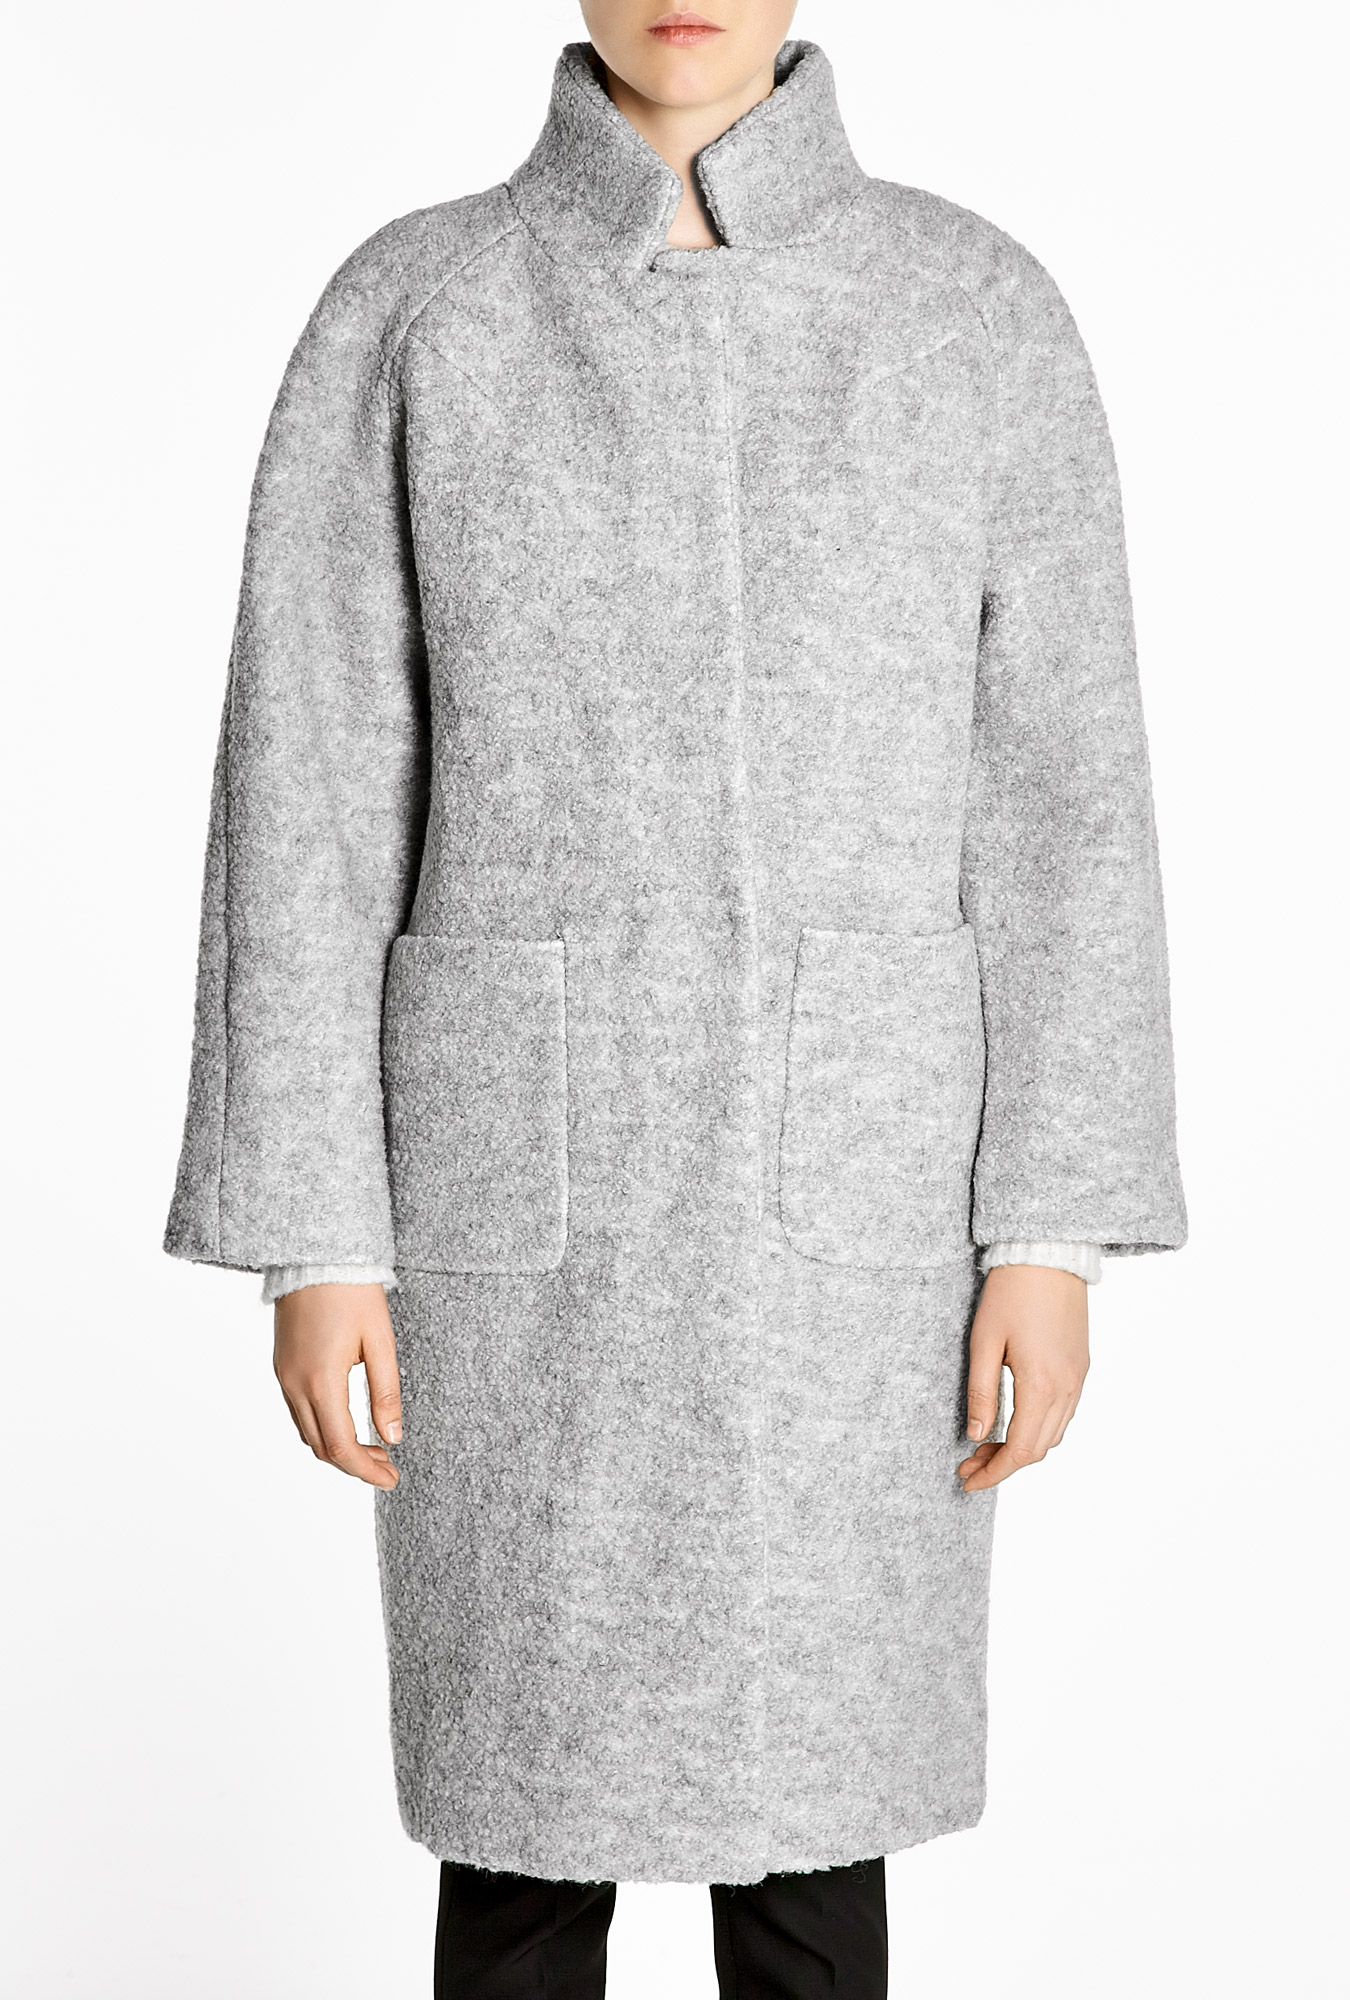 Ganni   Grey Melange Poodle Teddy Long Coat by Ganni